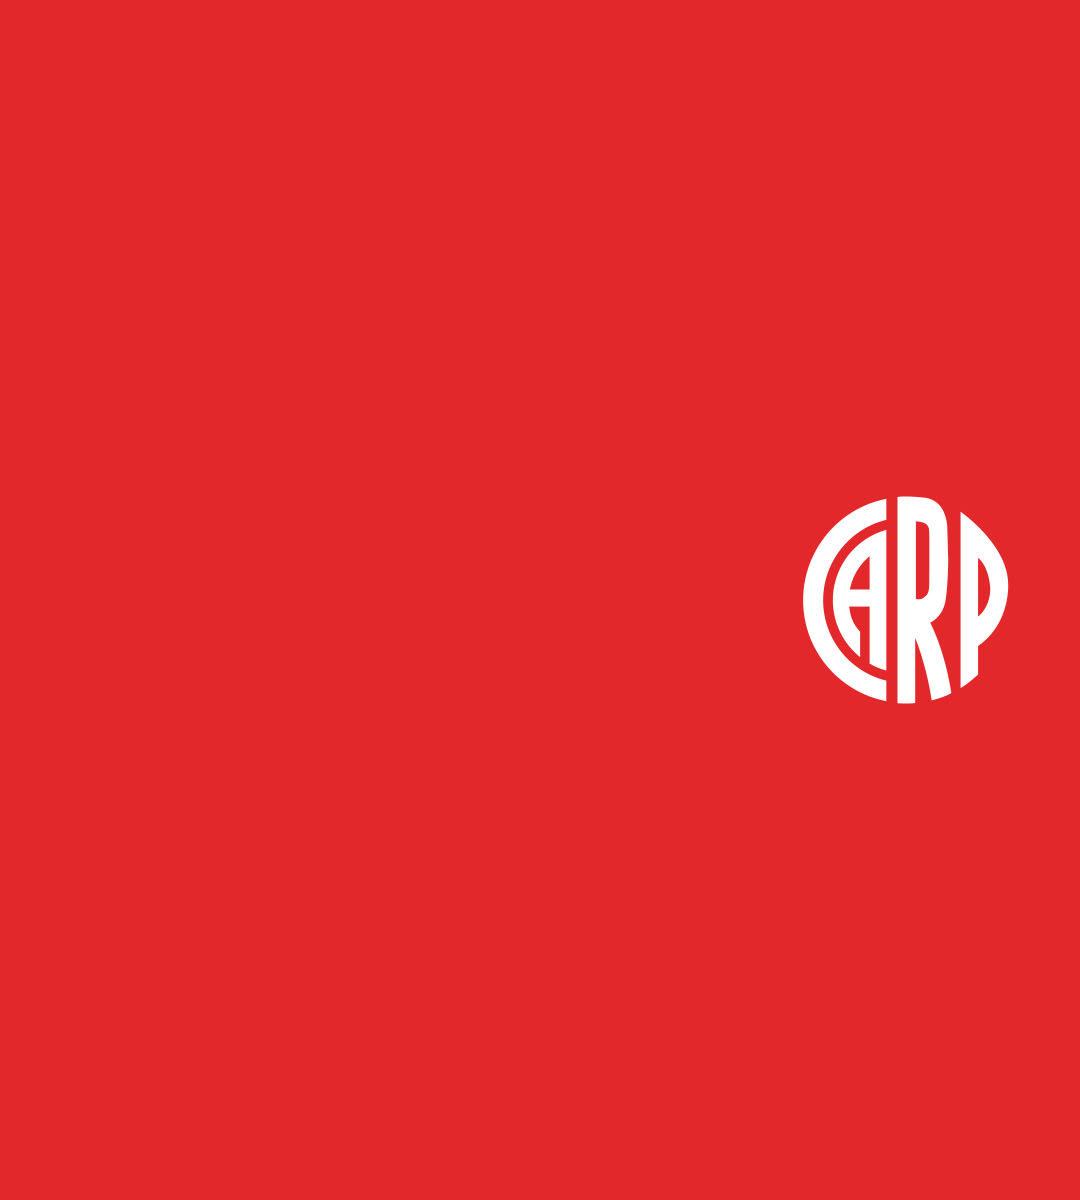 imagenes-de-river-plate-para-telefono-celular-fondos-de-pantalla-wallpaper-de-river-fondo rojo escudo vintage